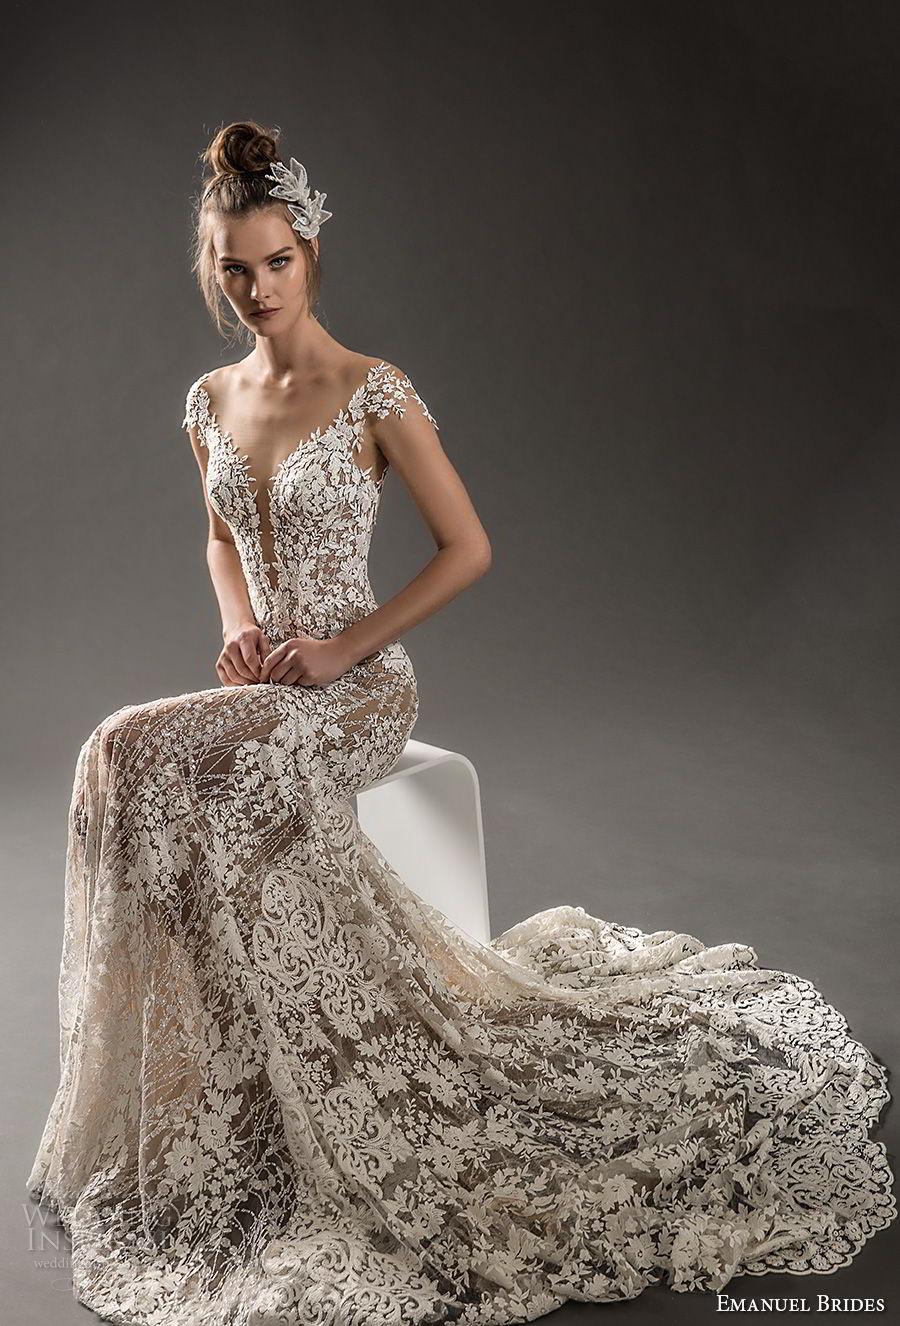 emanuel brides 2018 bridal cap sleeves deep plunging v neck full embellishment elegant sexy fit and flare mermaid wedding dress chapel train (03) mv